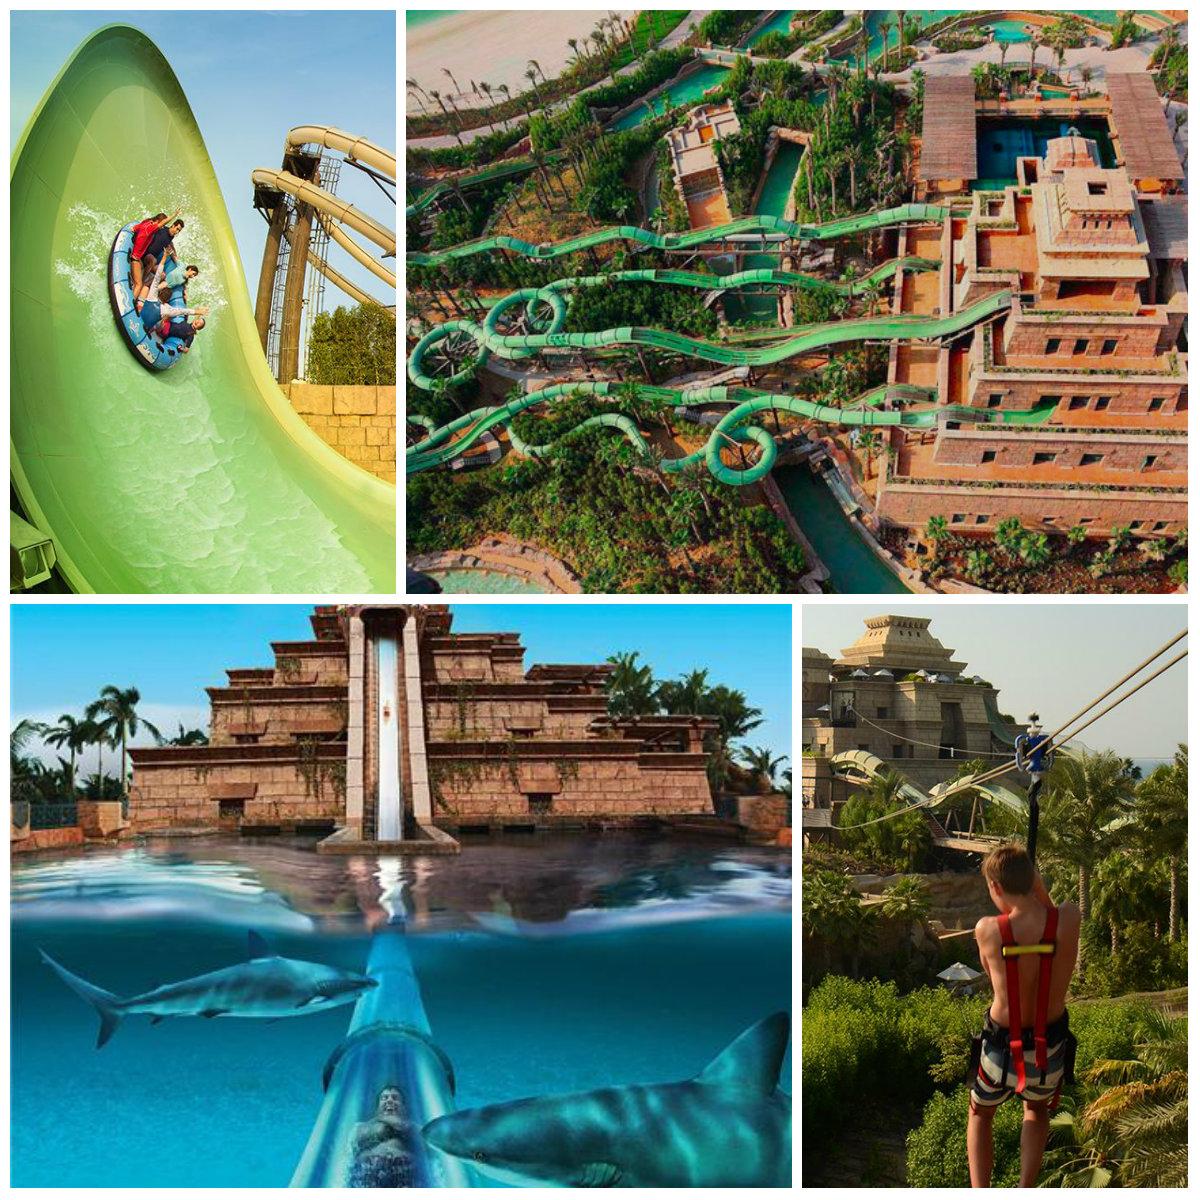 Atlantis The Palm Resort Dubai, UAE